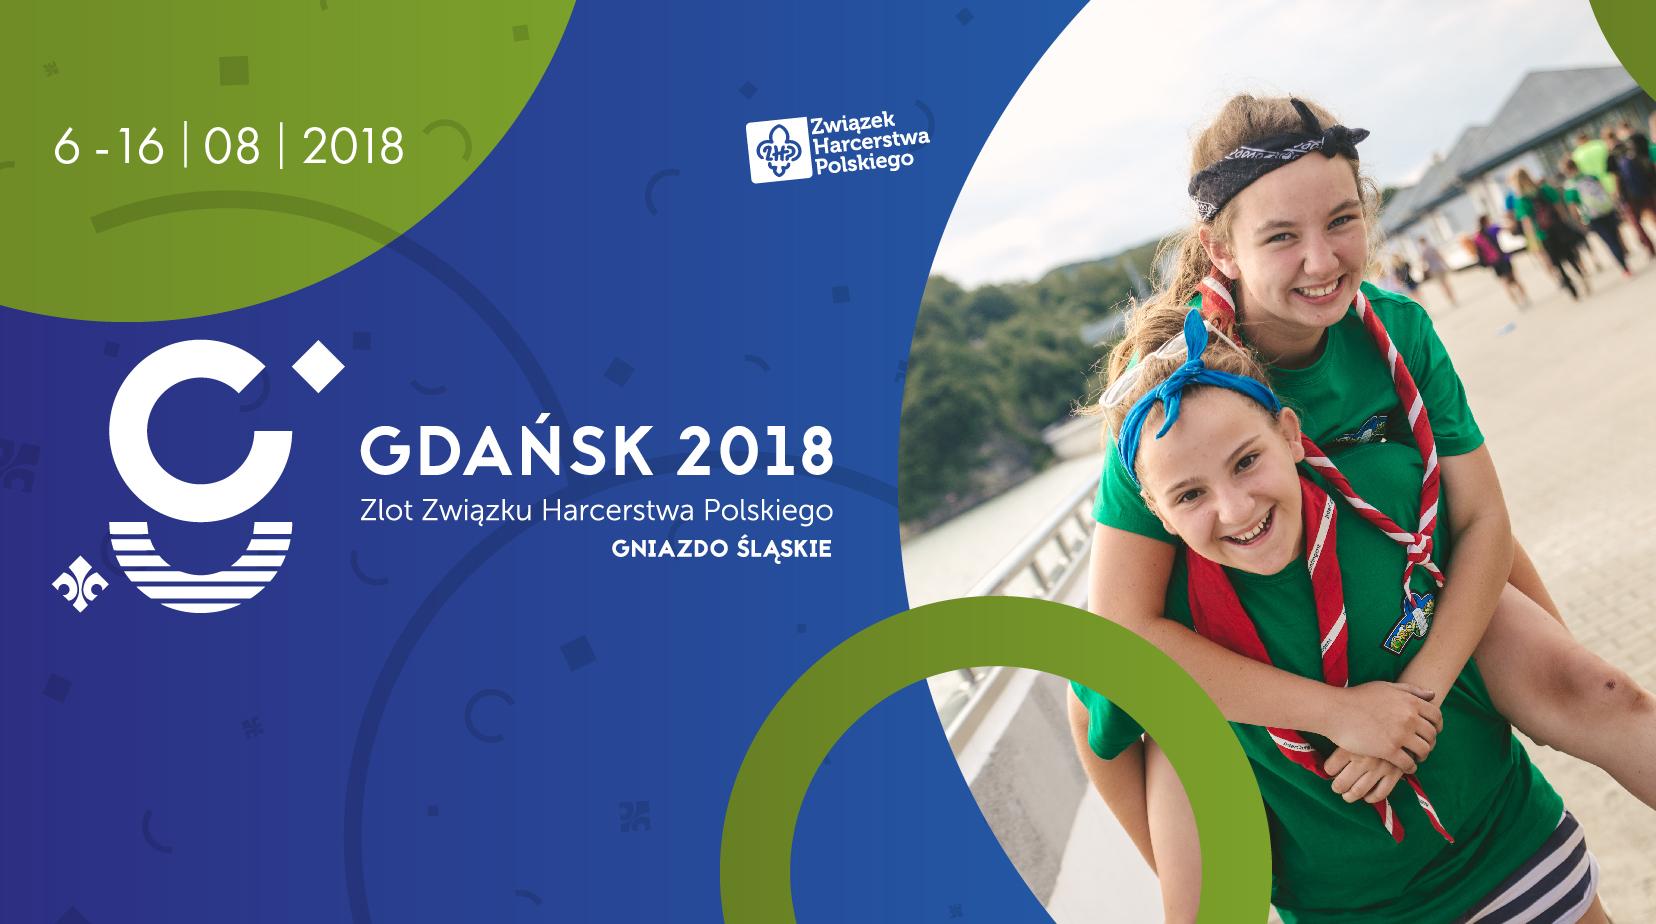 Gdansk2018_Facebook-Fanpage-Gniazda-Cover-Śląskie